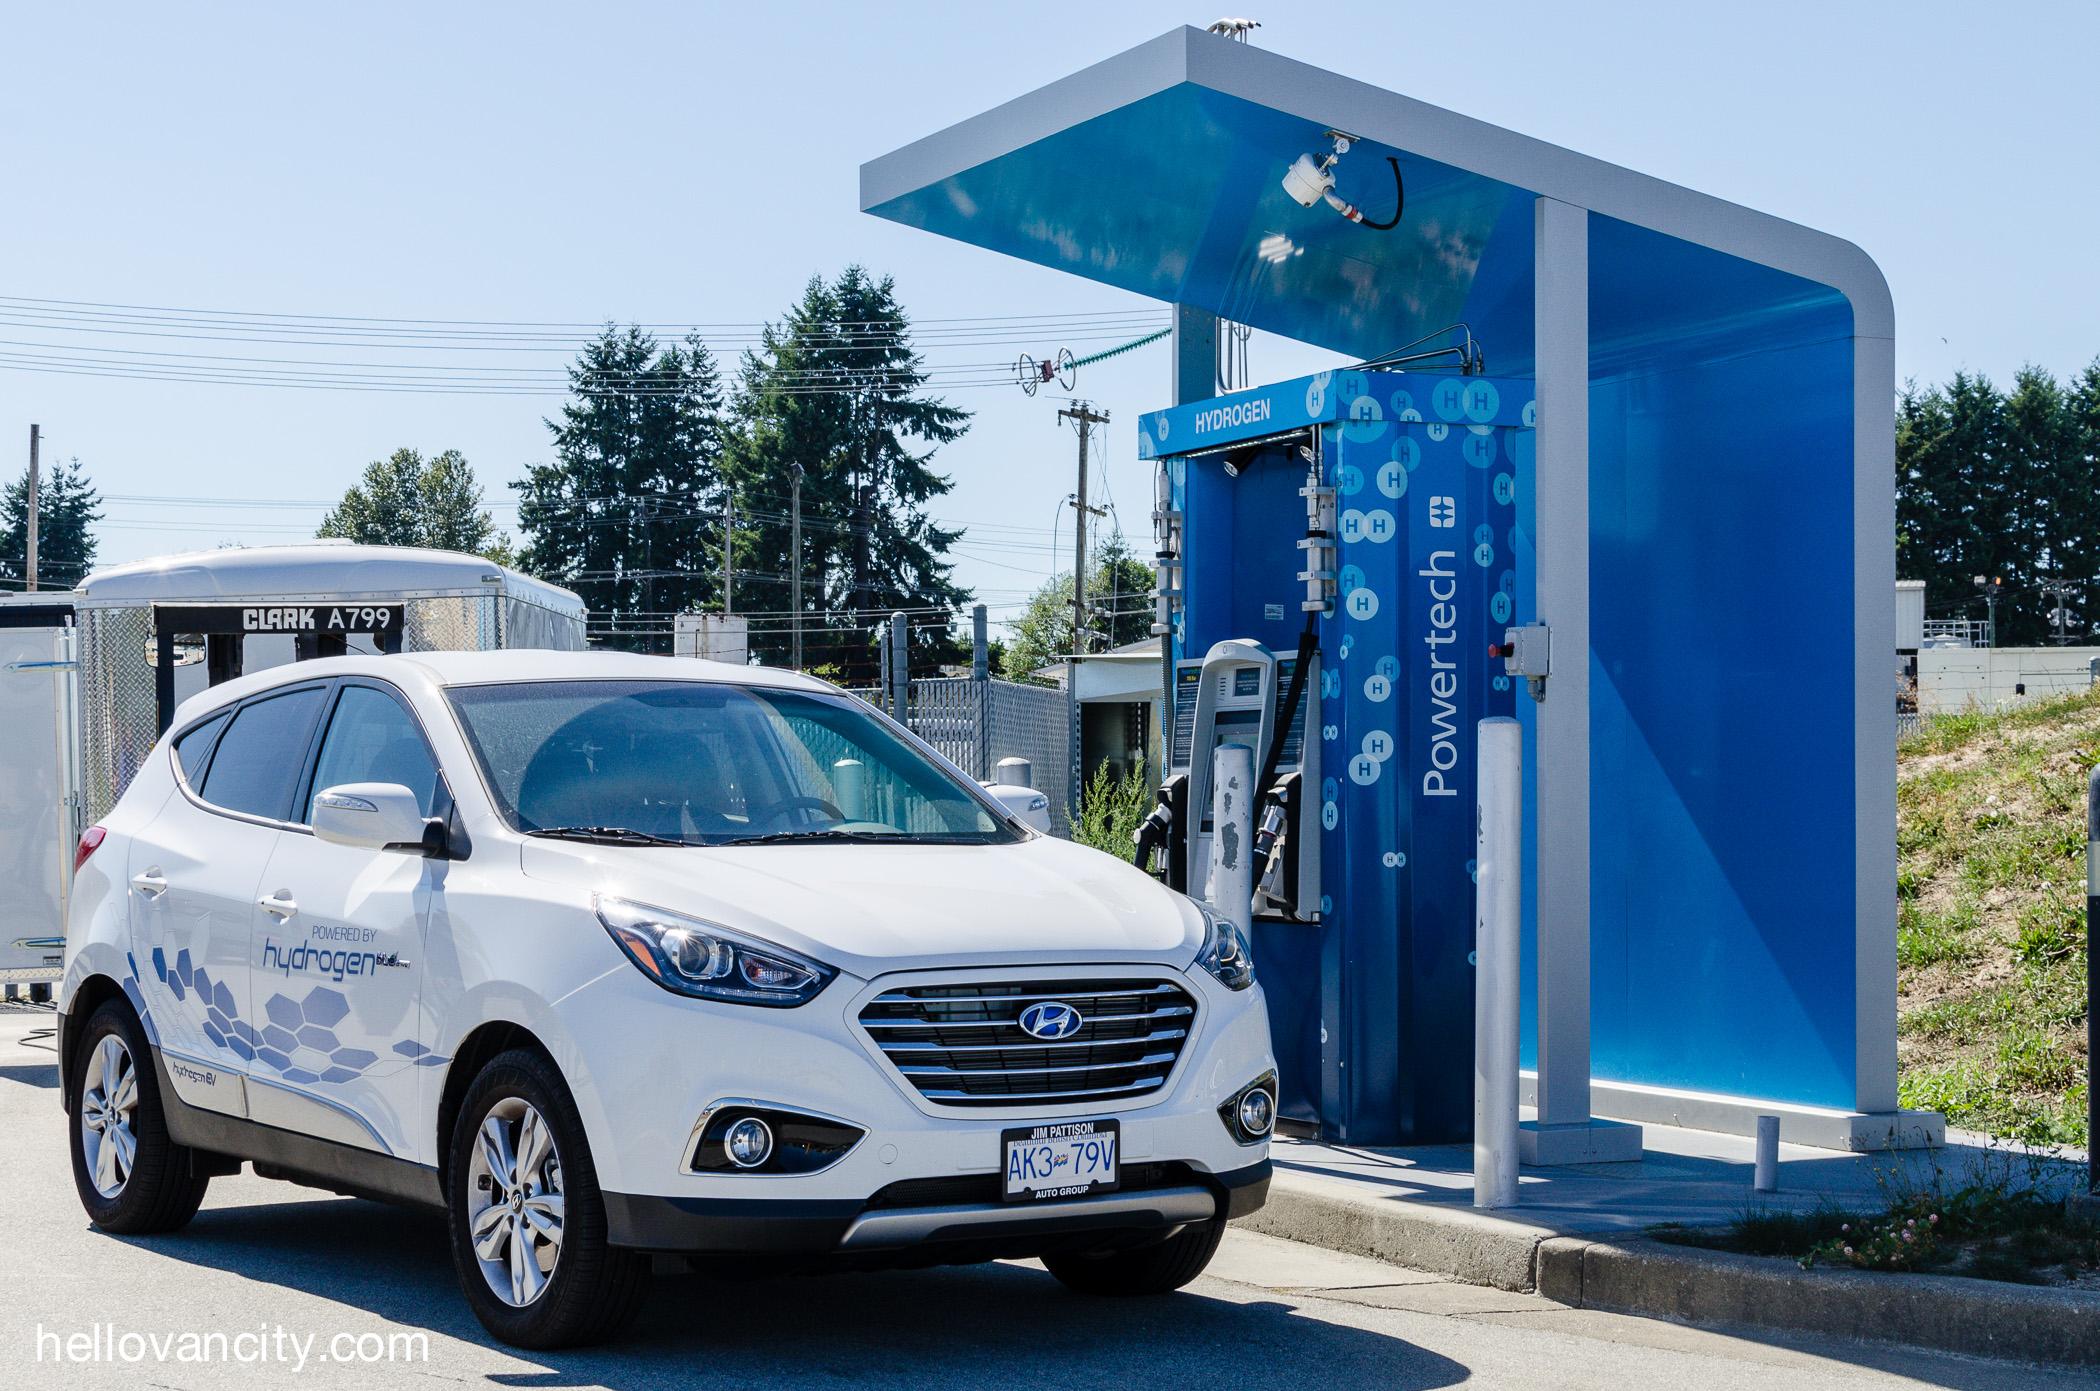 Review 2015 Hyundai Tucson Hydrogen Fuel Cell Cuv Hello Vancity